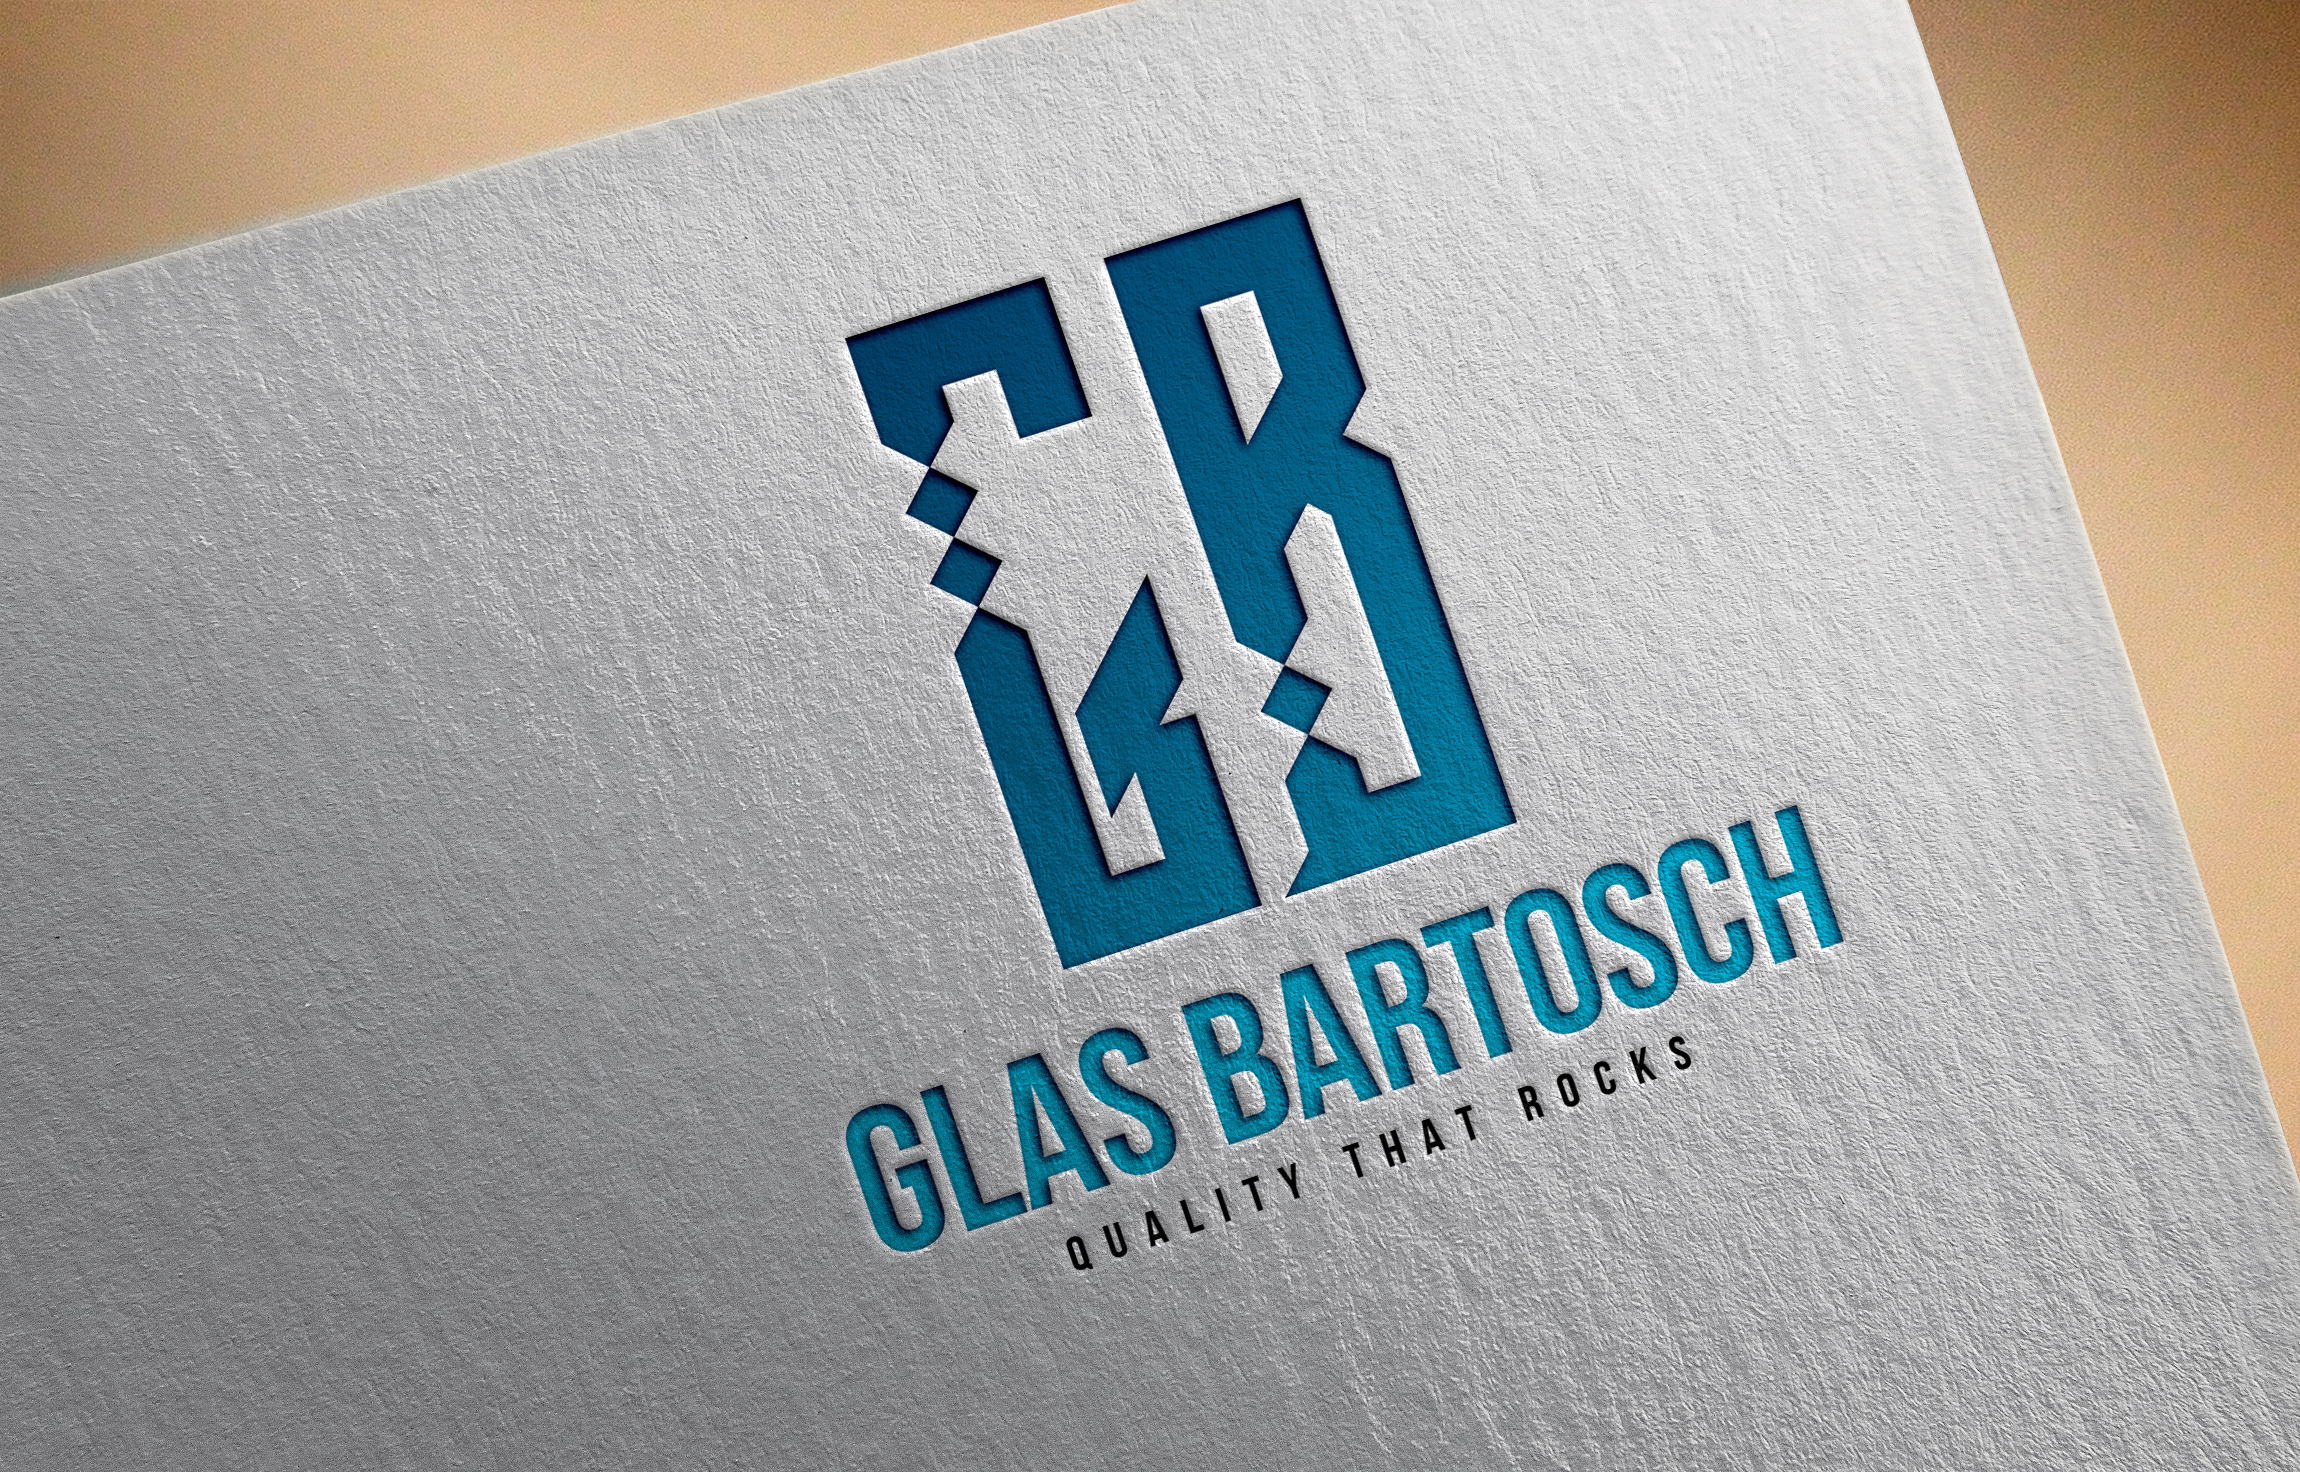 design #1 of Logostudio2020